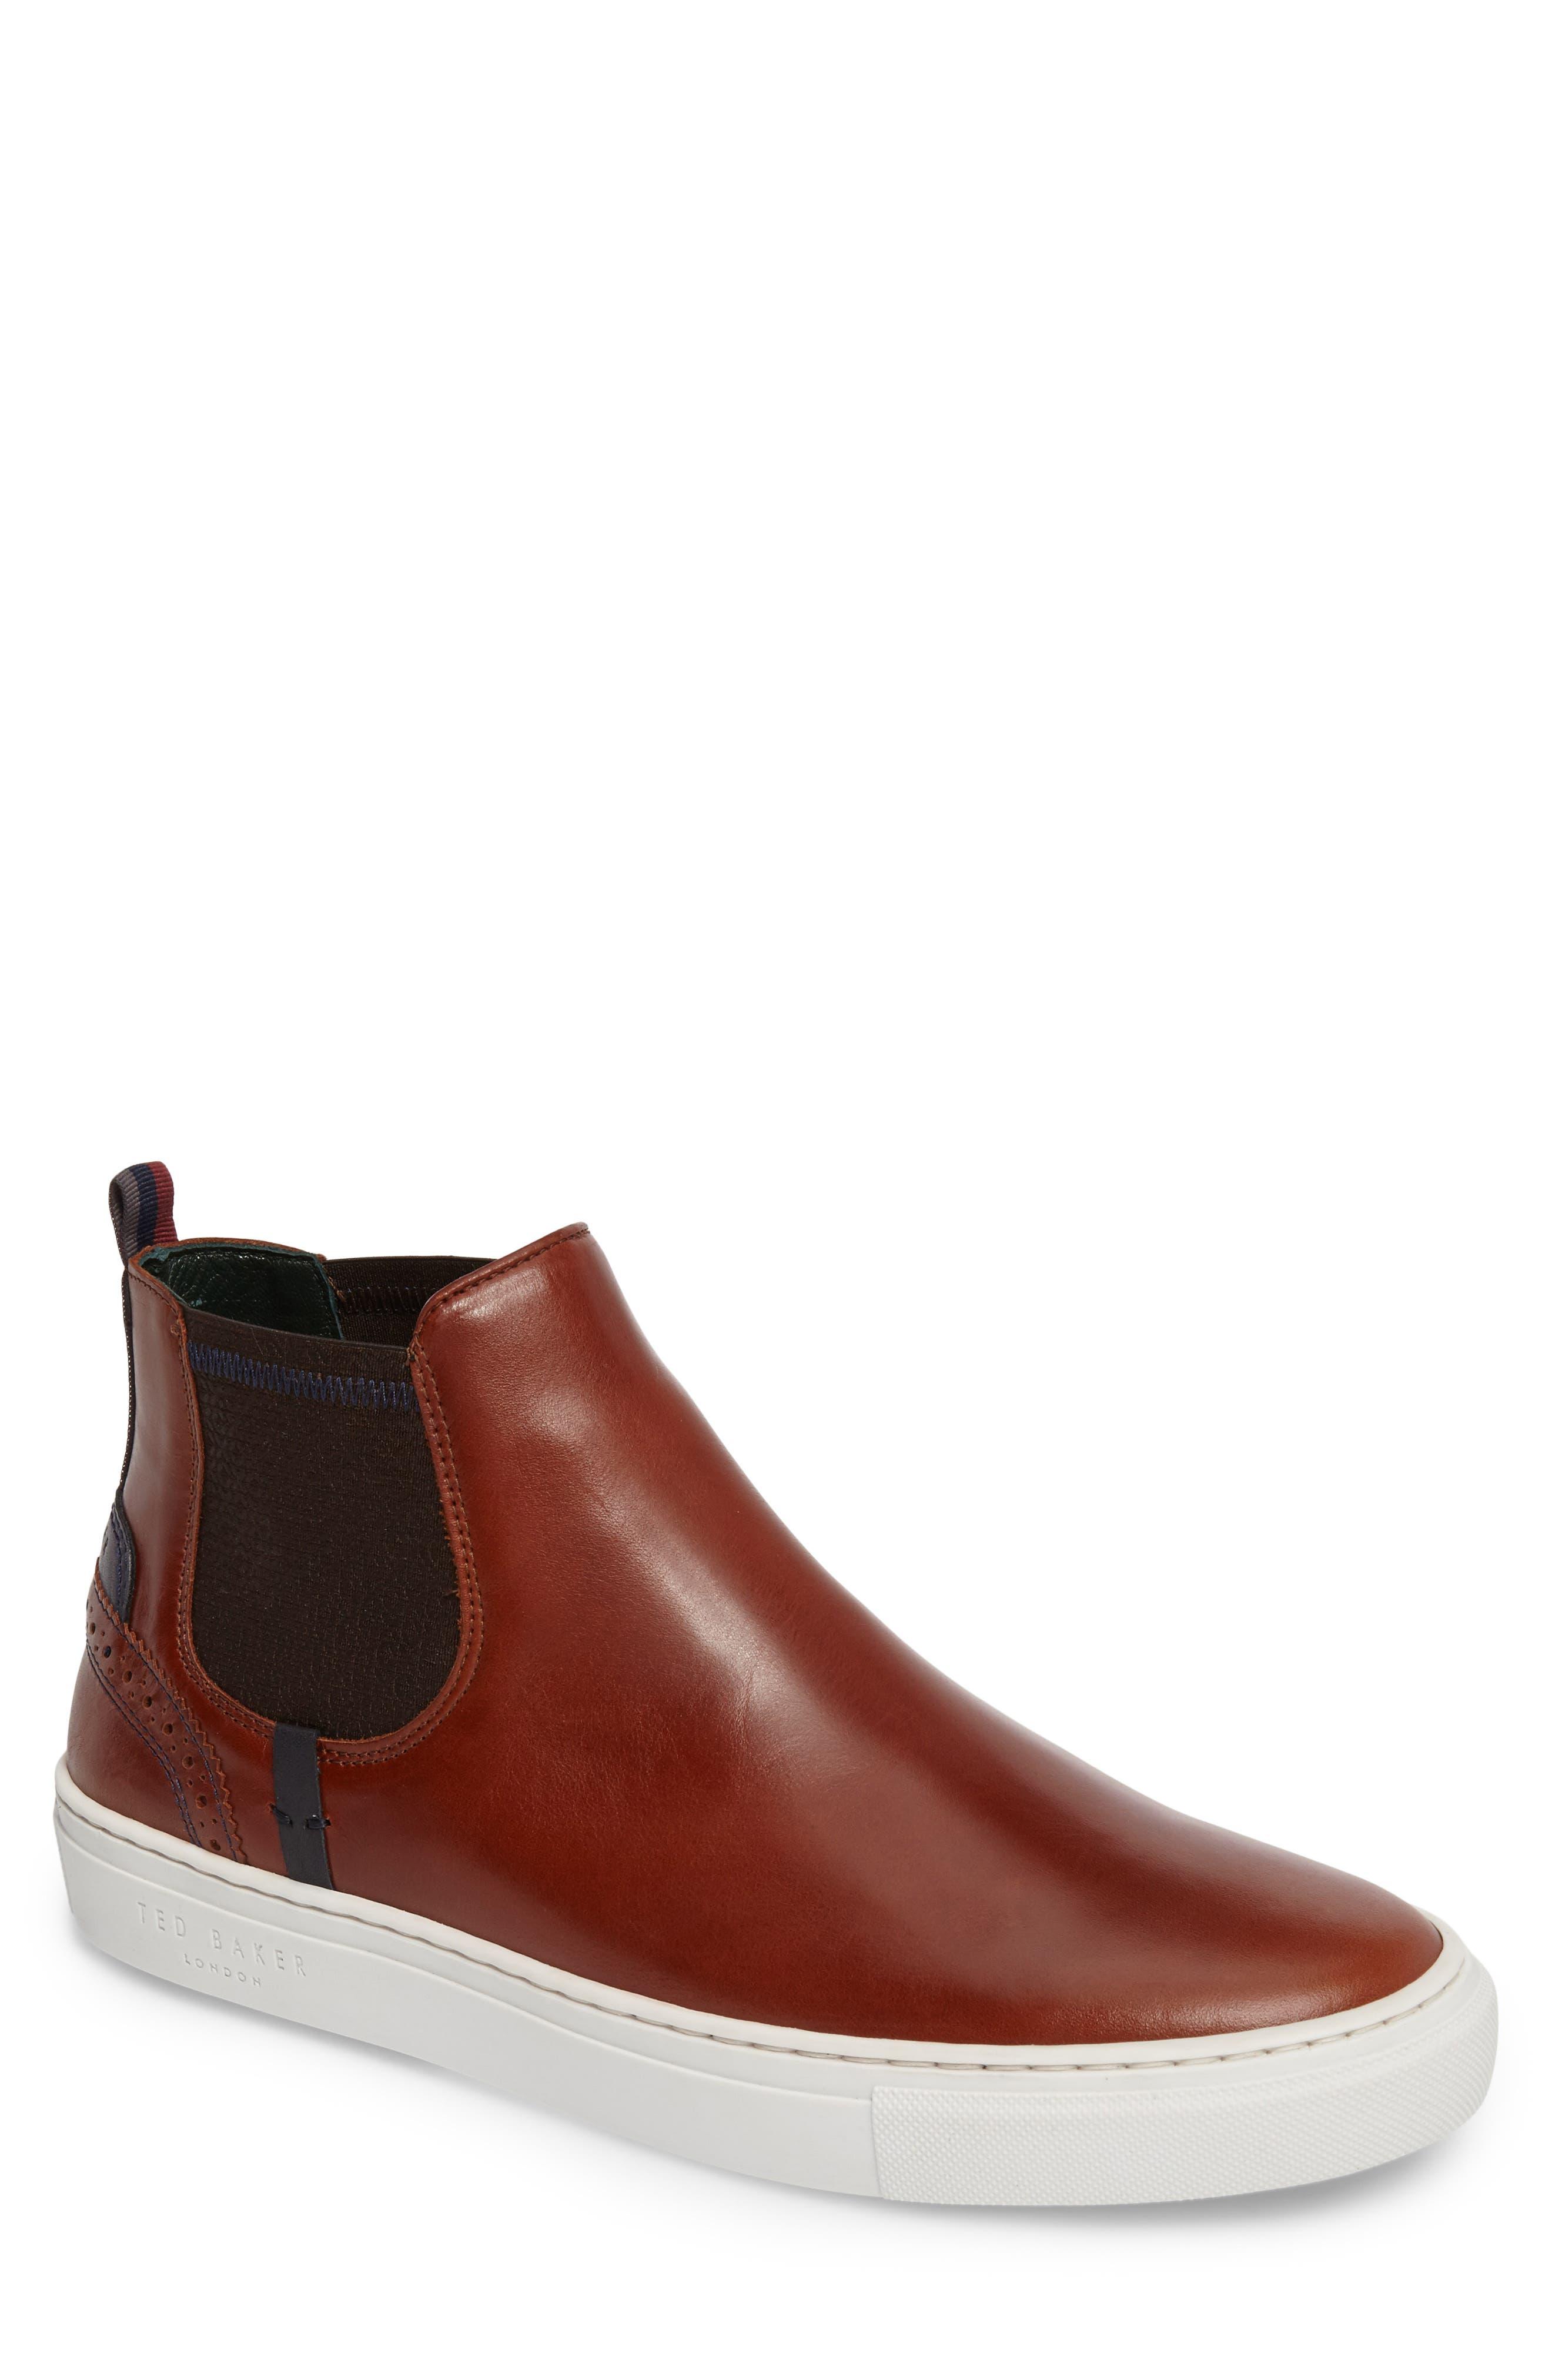 Lykeen Chelsea Boot,                         Main,                         color, 204